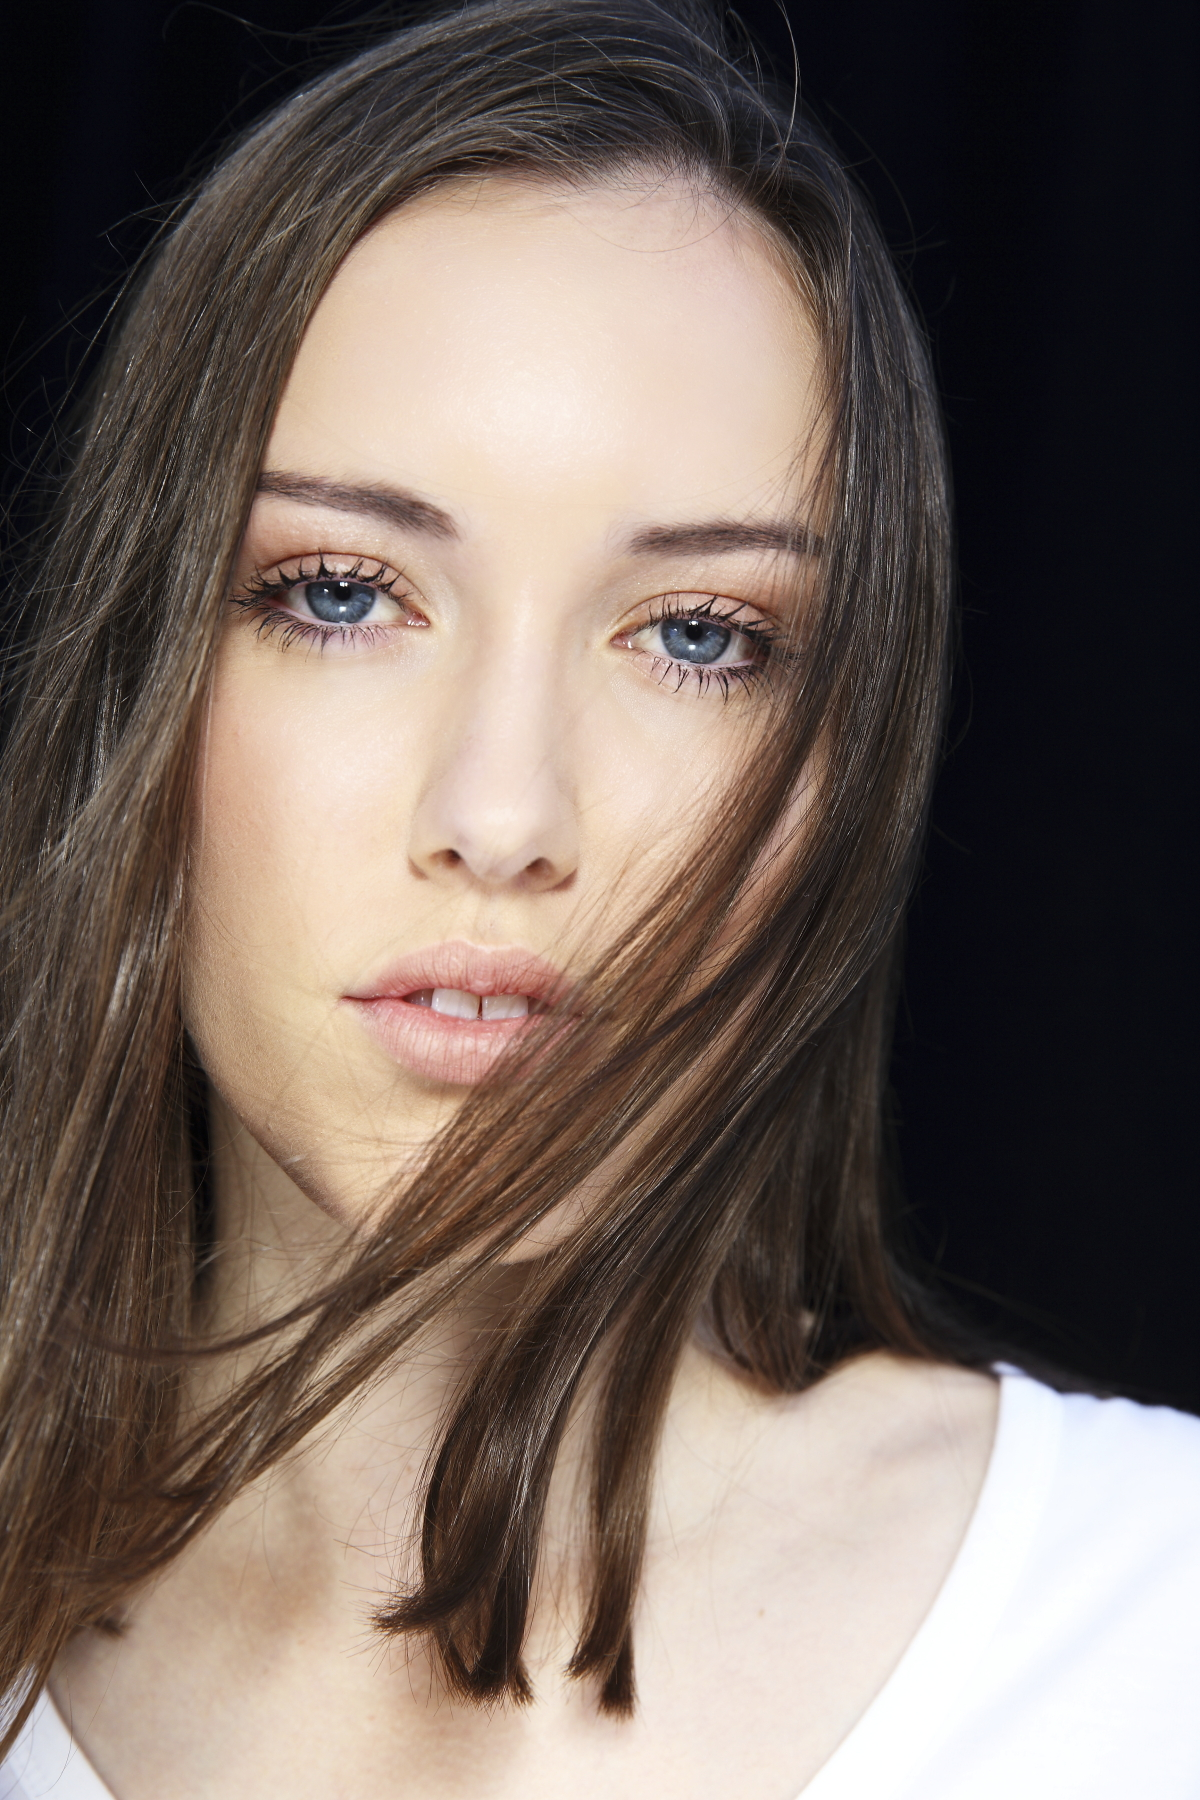 Sonny Vandevelde Hannah Taylor From Chadwicks Models